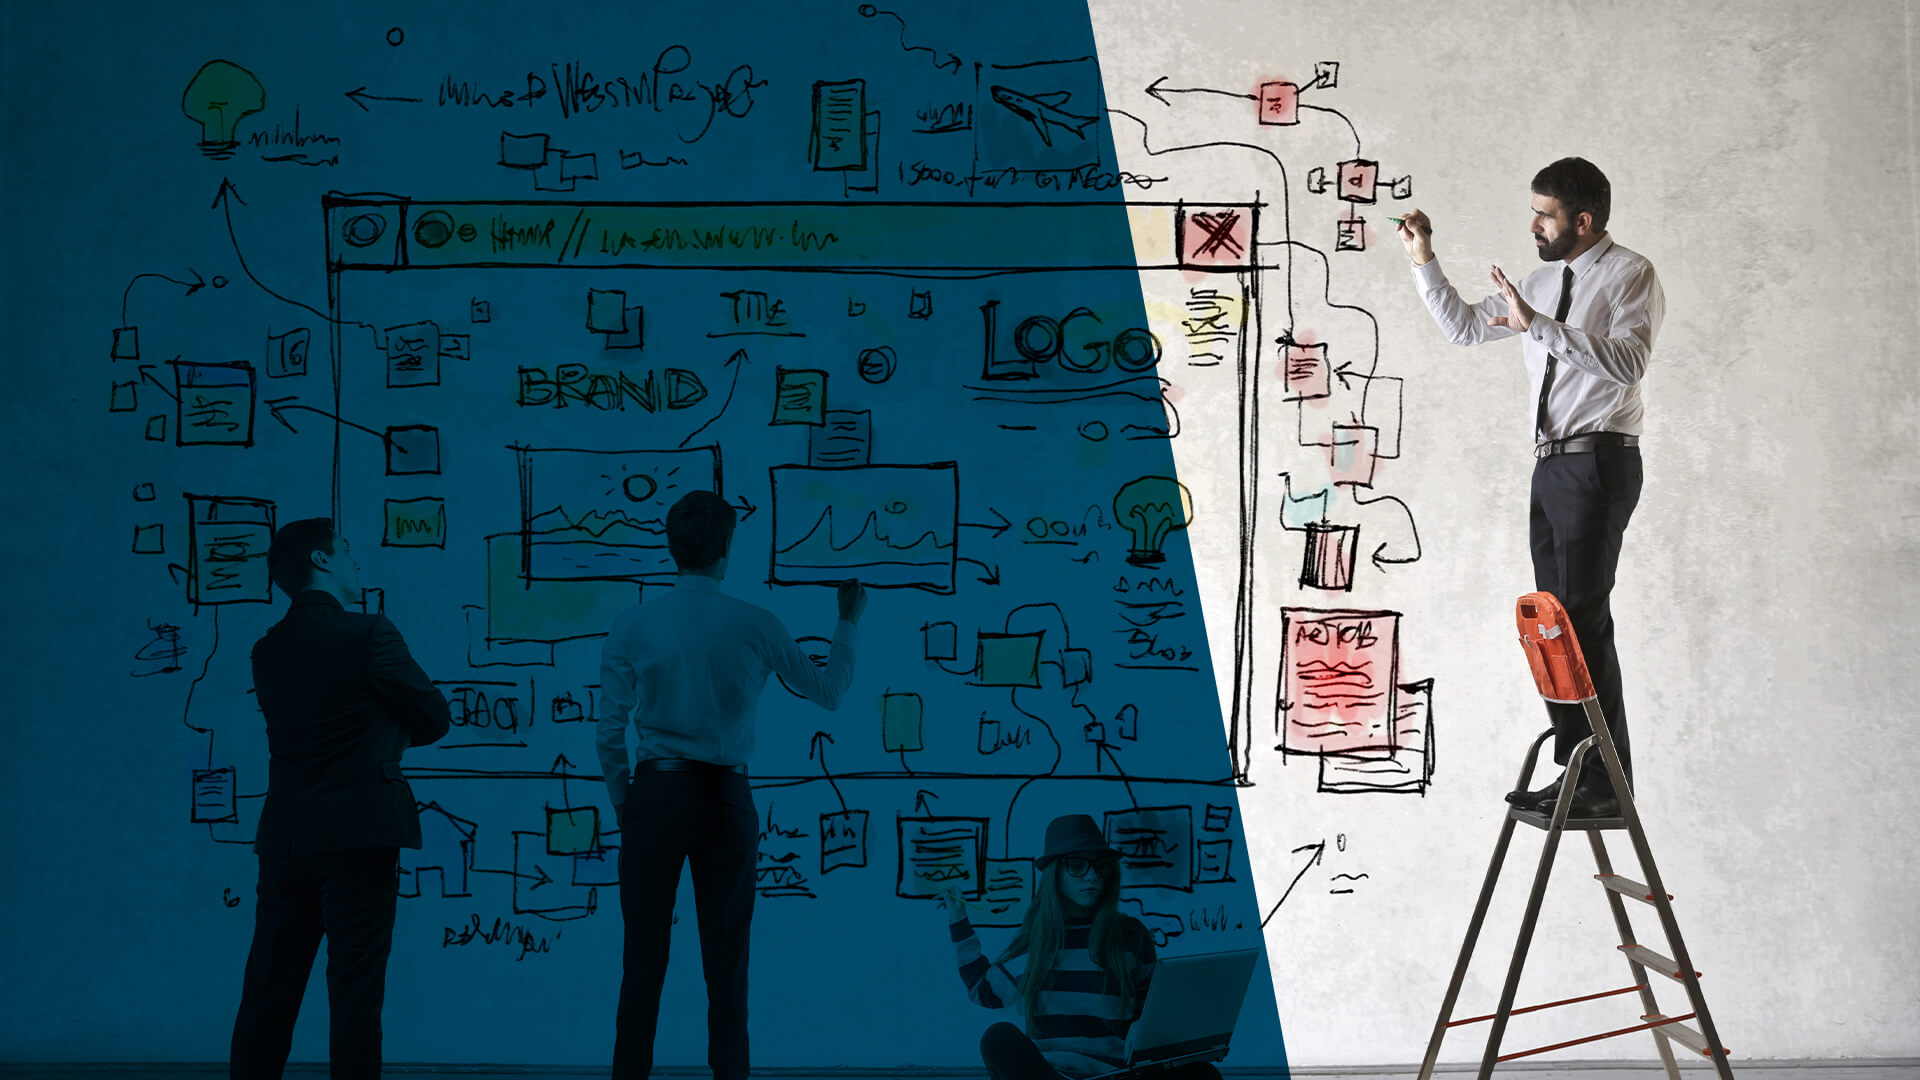 persoperm Leistungen - Employer Branding- Konzeption Arbeitgebermarke